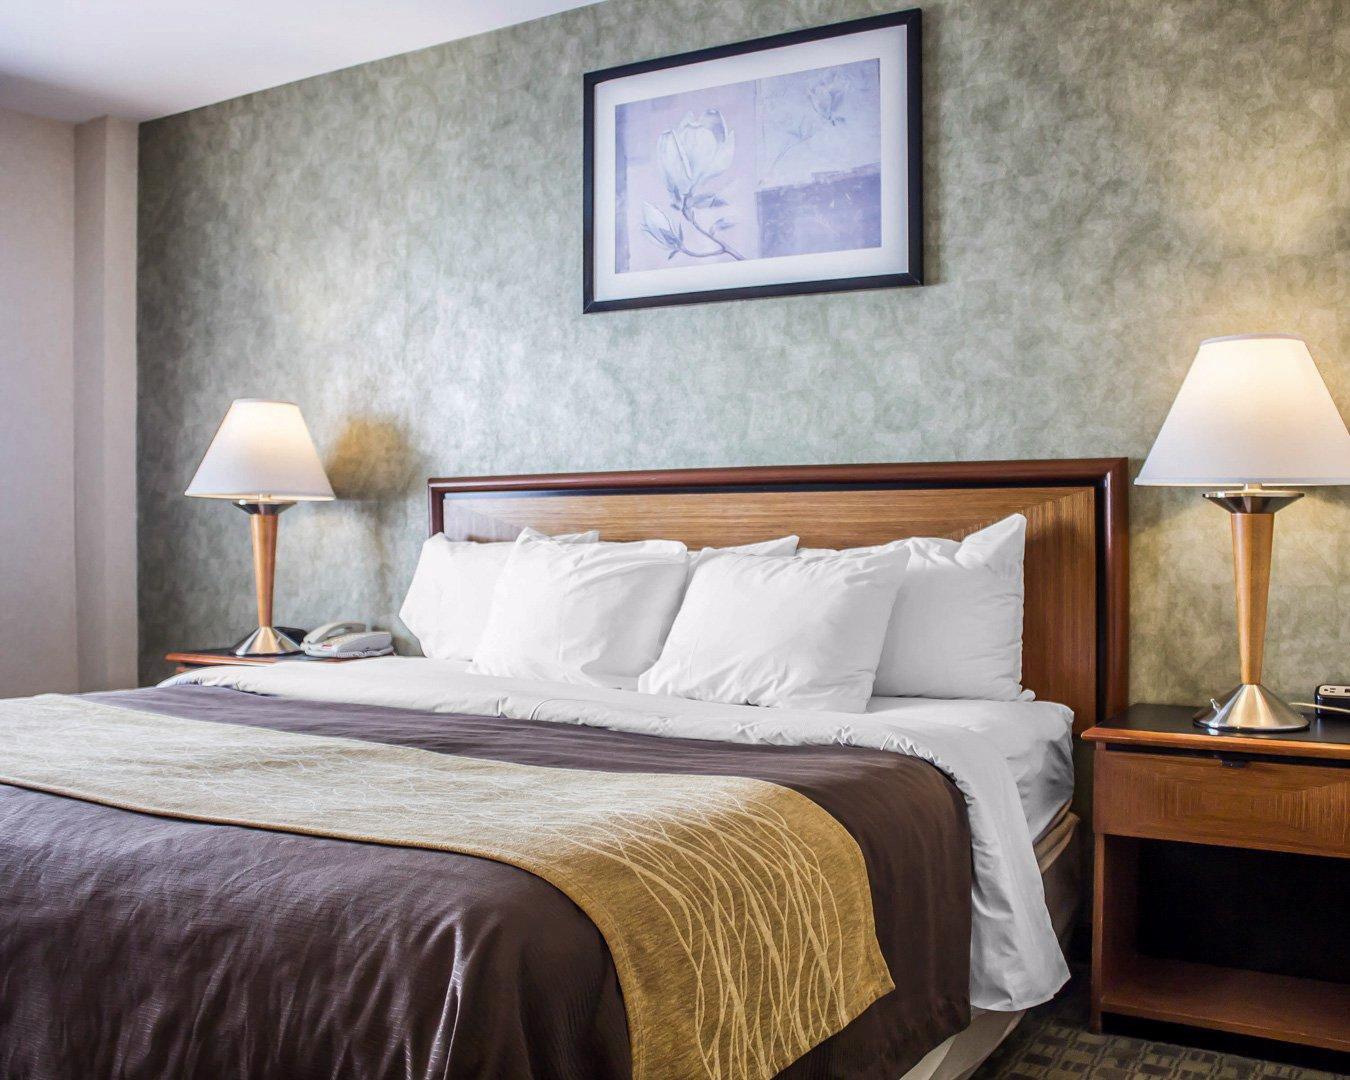 Comfort inn in brooklyn ny 11235 for Linden motor inn brooklyn